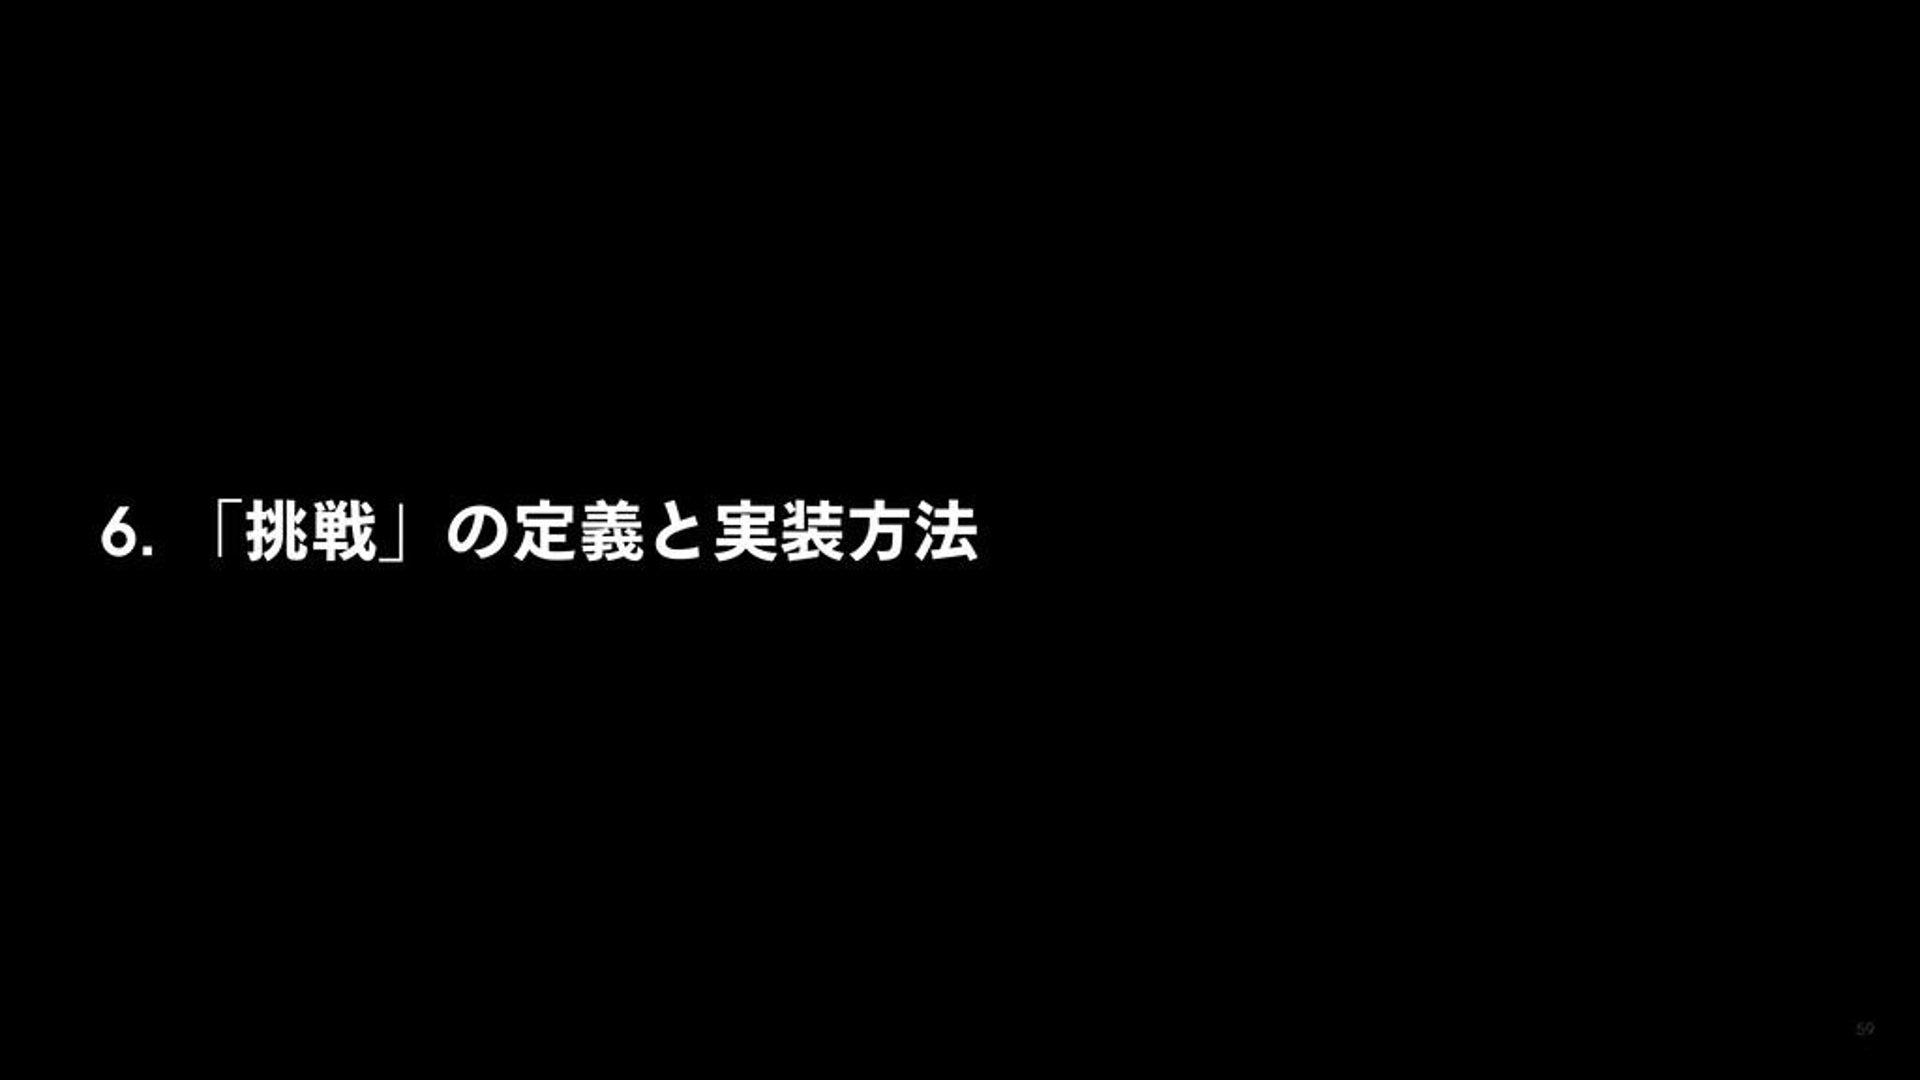 6. ʮઓʯͷఆٛͱ࣮ํ๏